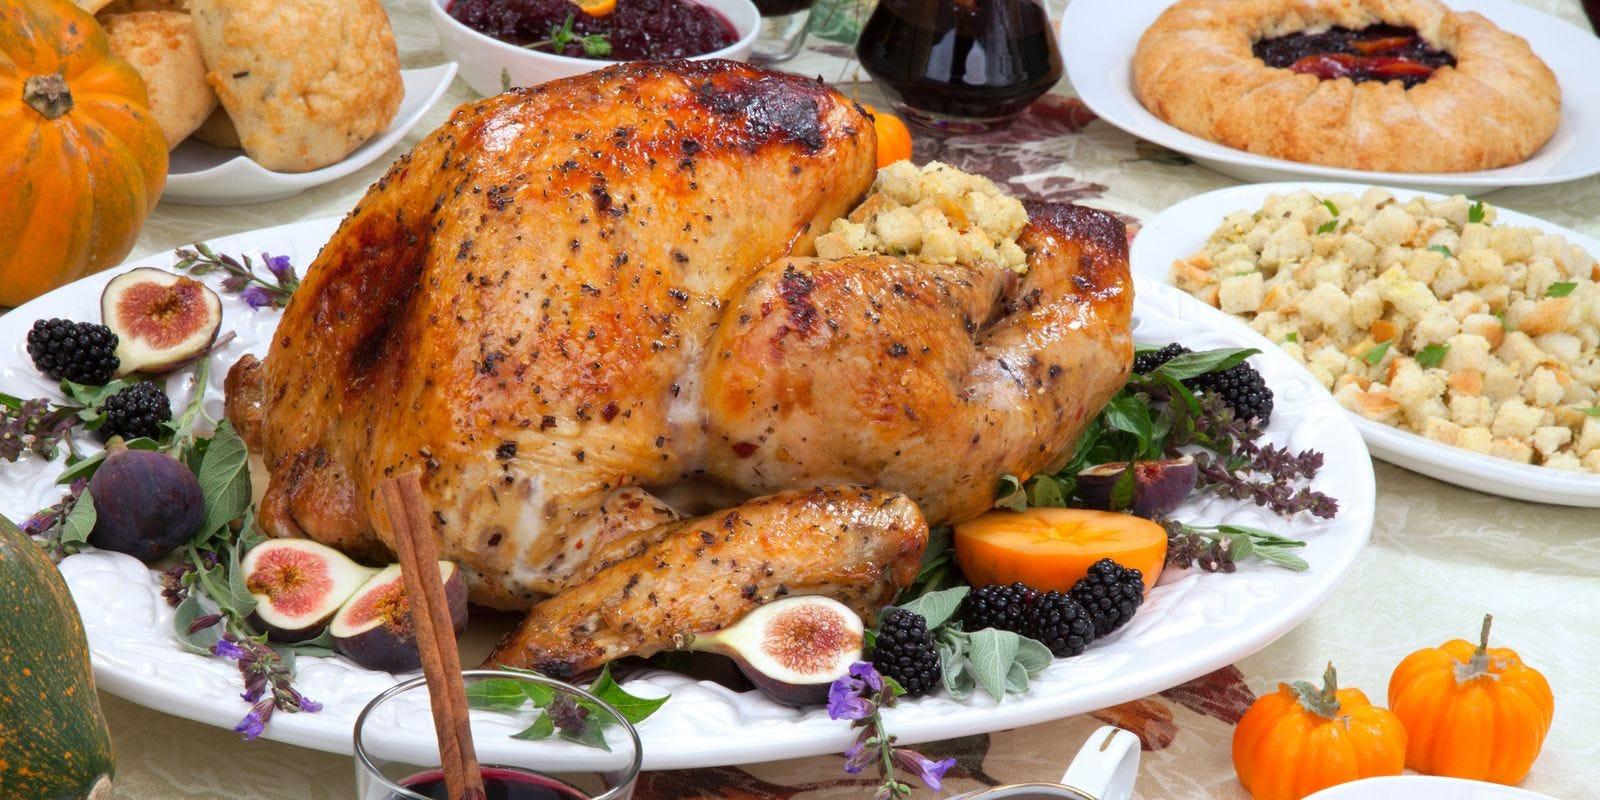 Thanksgiving Turkey Dinner  Cost of Thanksgiving dinner takes a surprising turn